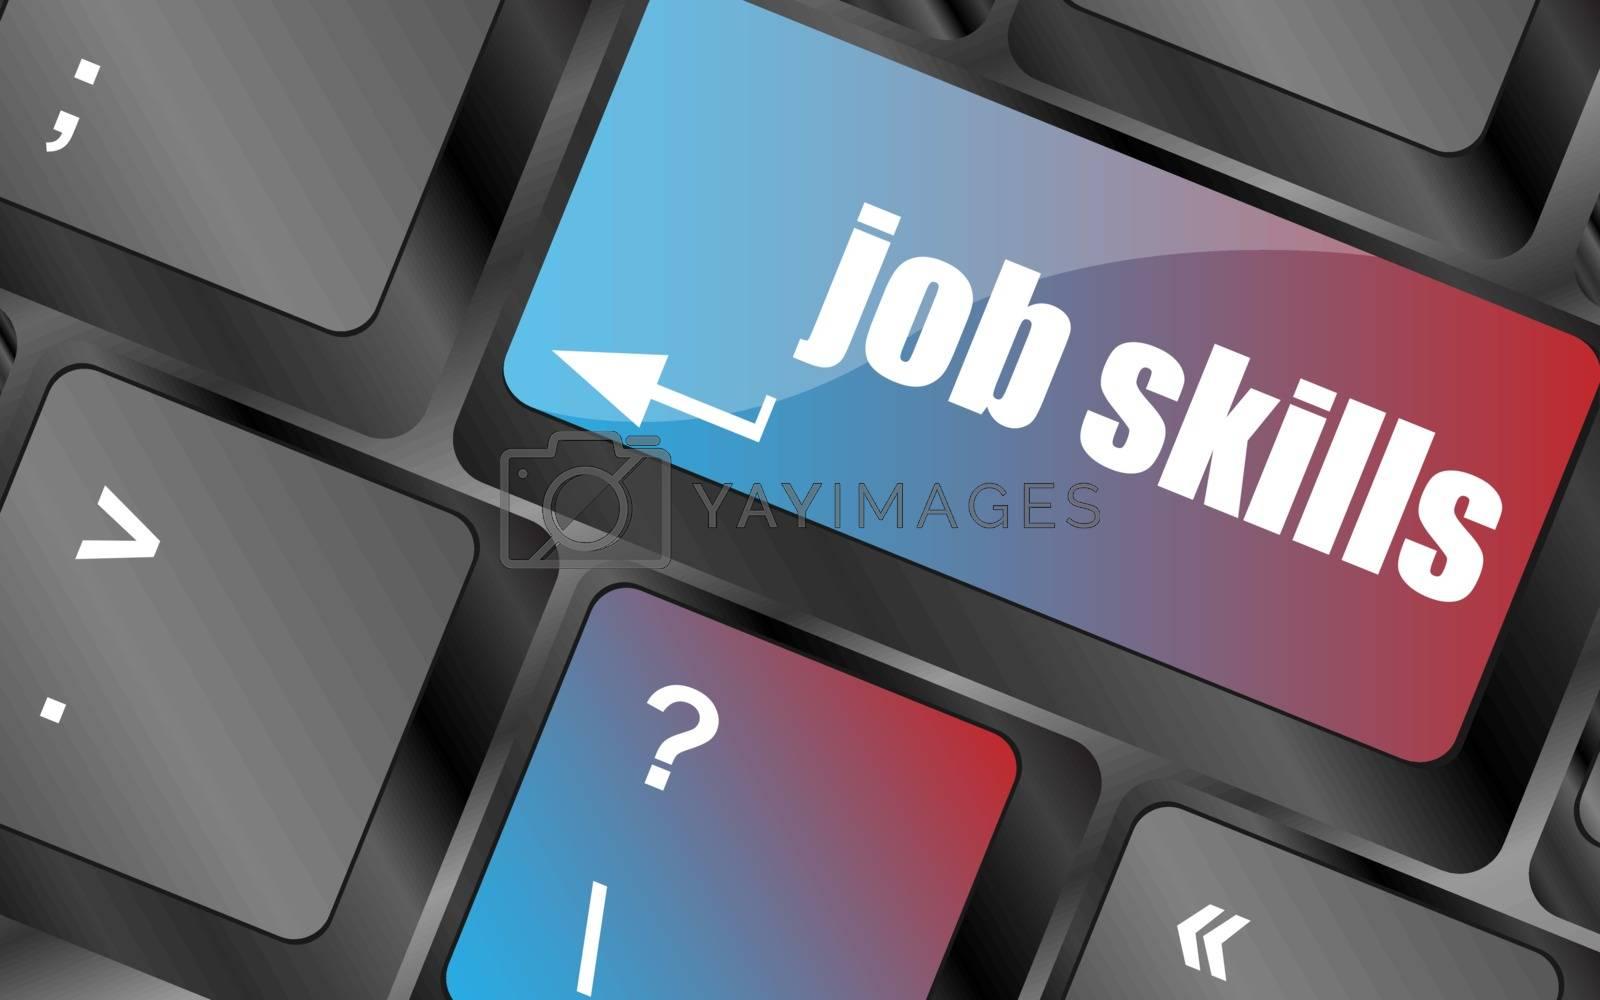 Computer keyboard with job skills key. business concept vector . keyboard keys, keyboard button, keyboard icon